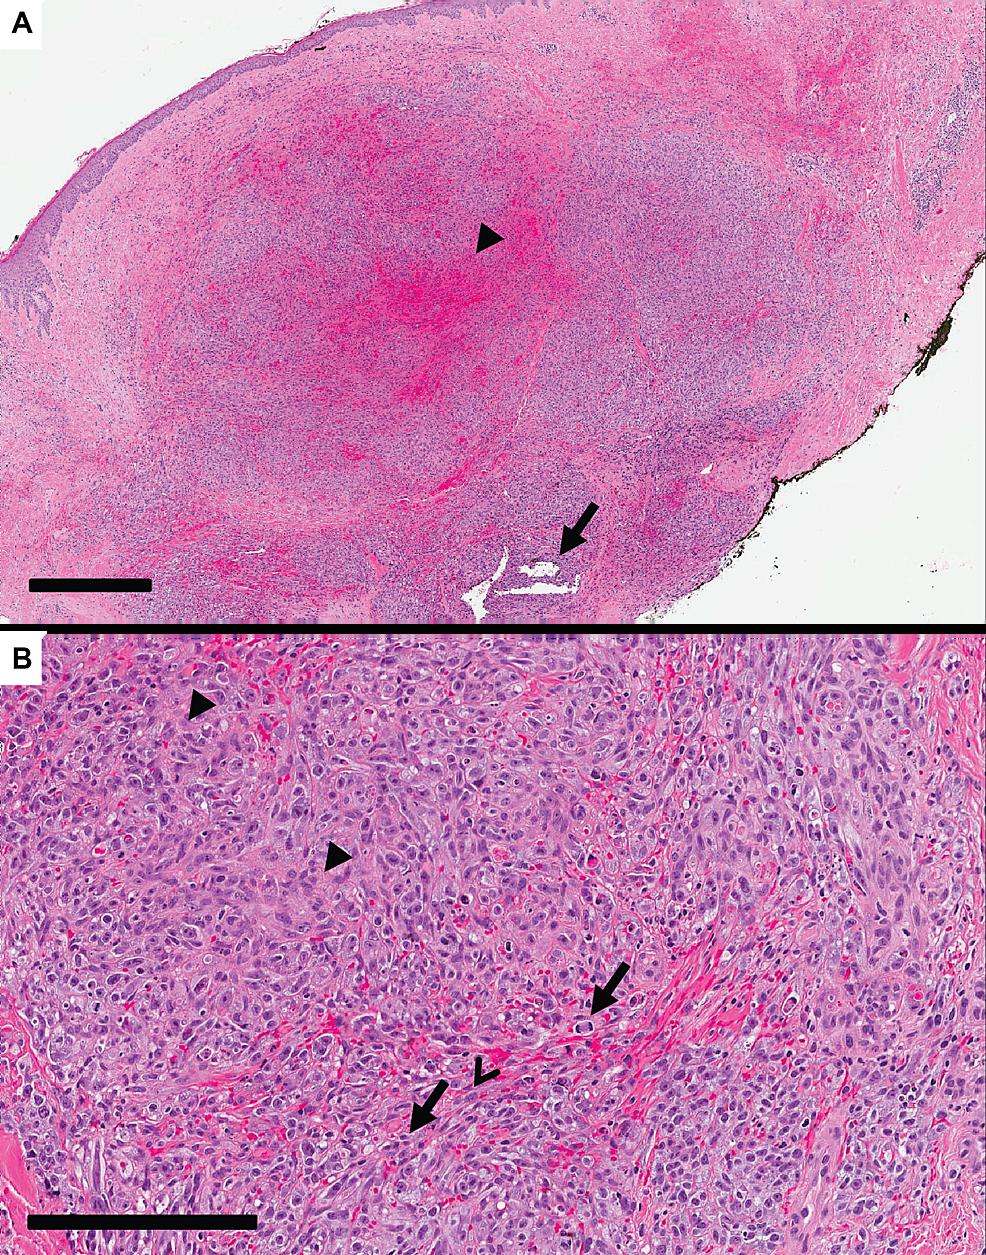 Biopsy-micrographs